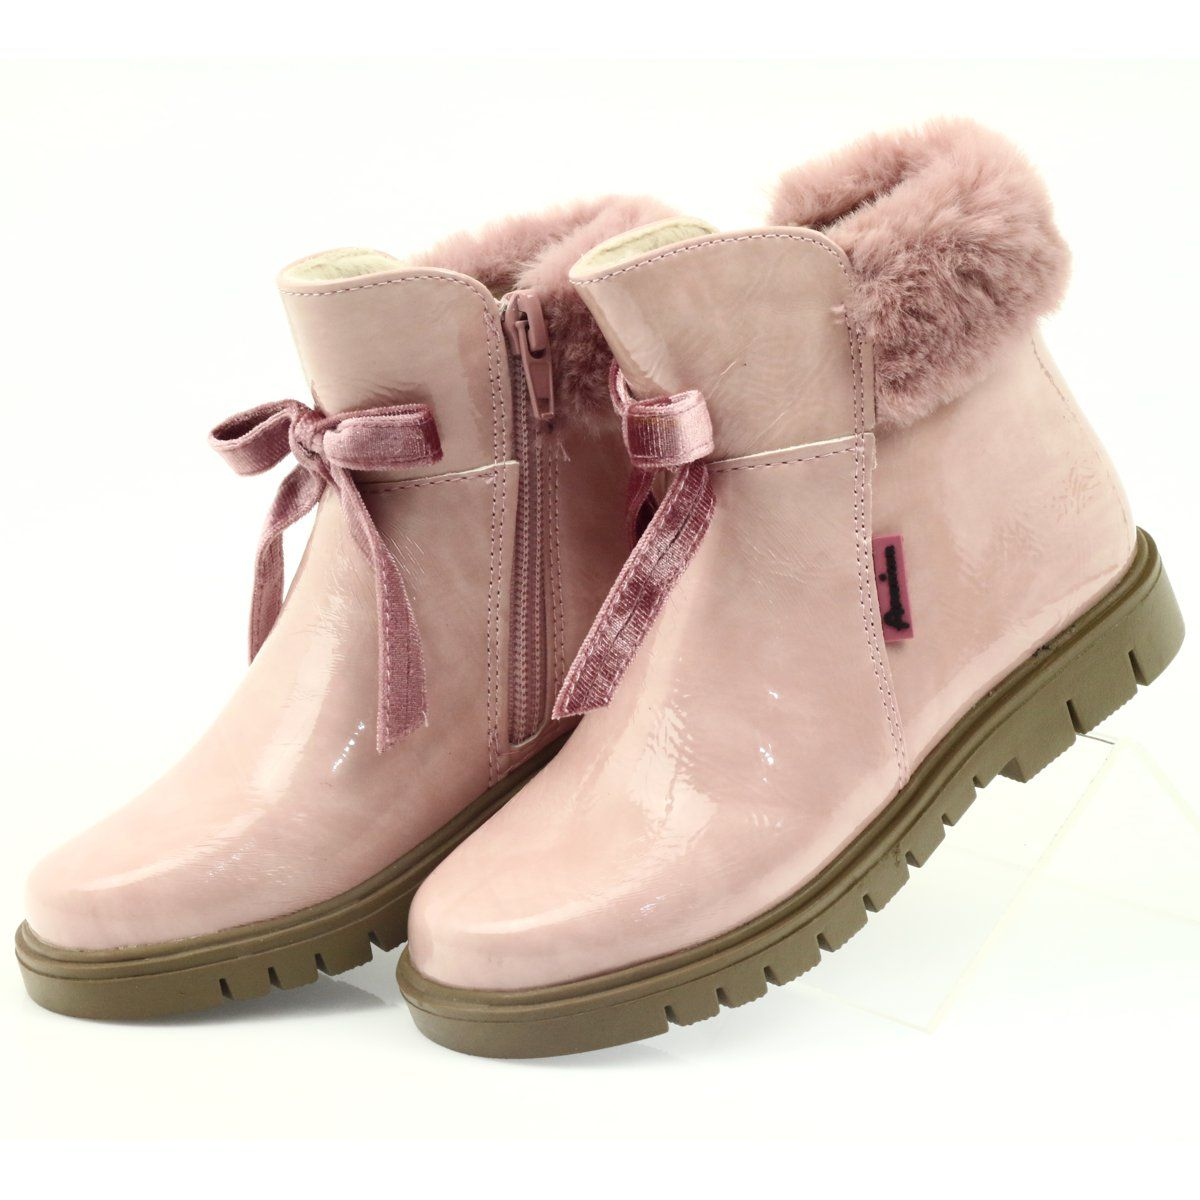 American Club American Kozaki Botki Buty Zimowe 18015 Rozowe Boots Timberland Boots Shoes